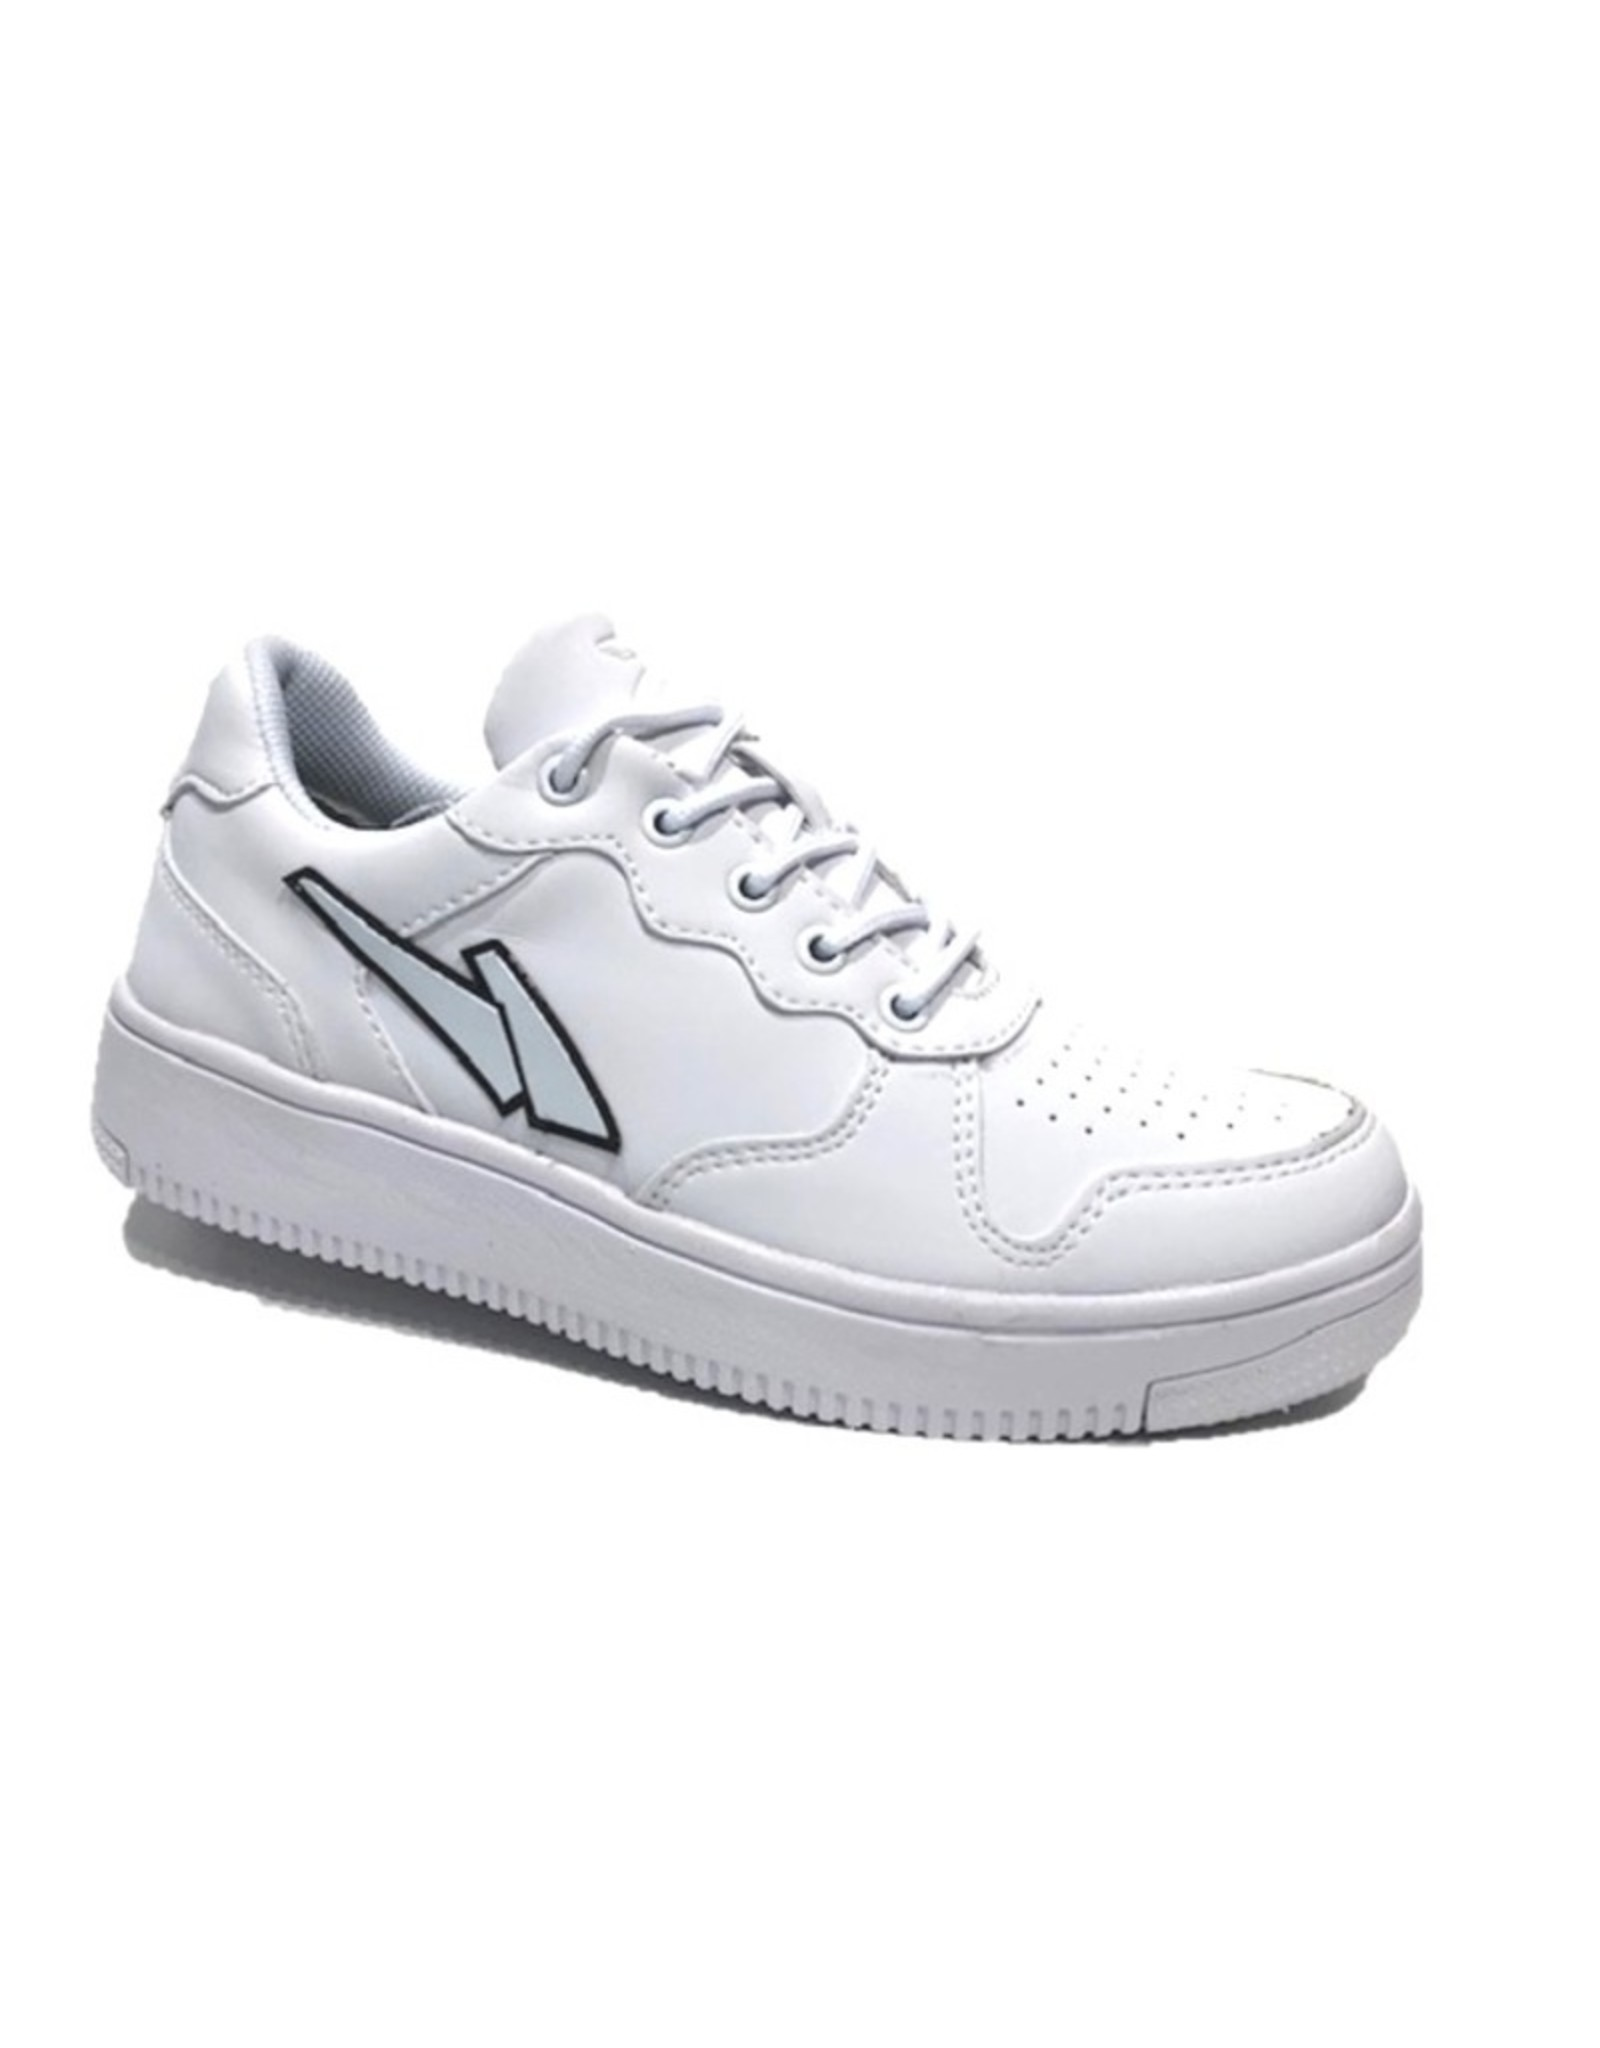 Piedro Piedro - Witte Lage Jongens Sneaker